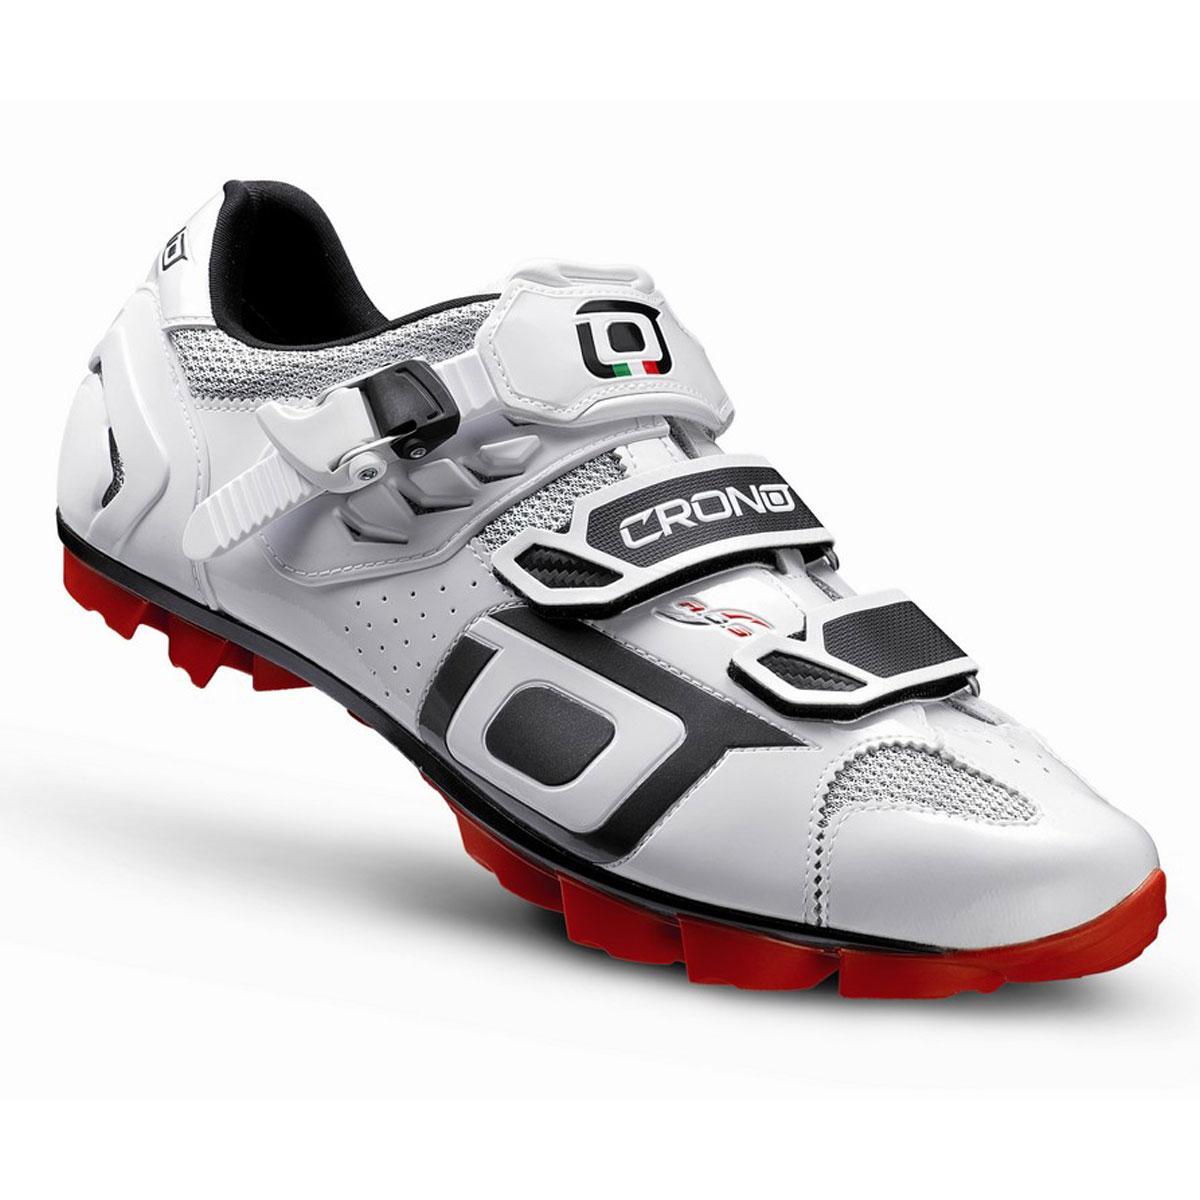 Boty Crono MTB Track white, 45